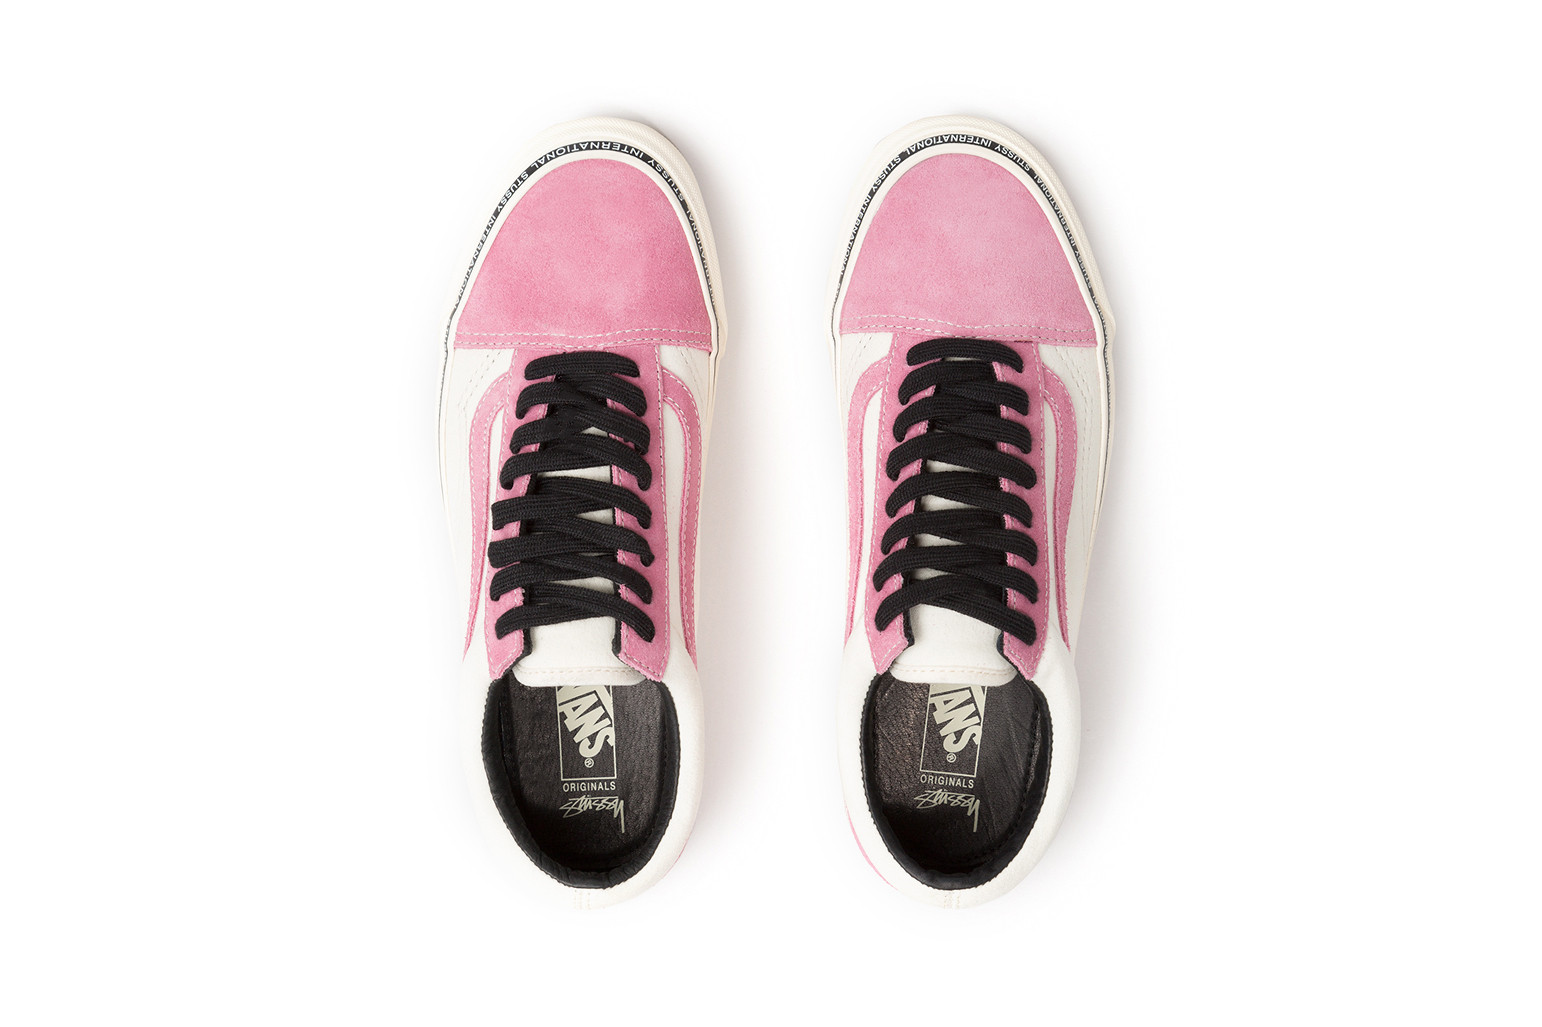 Stussy x Vans 2017 Summer Old Skool Slip-On Chukka